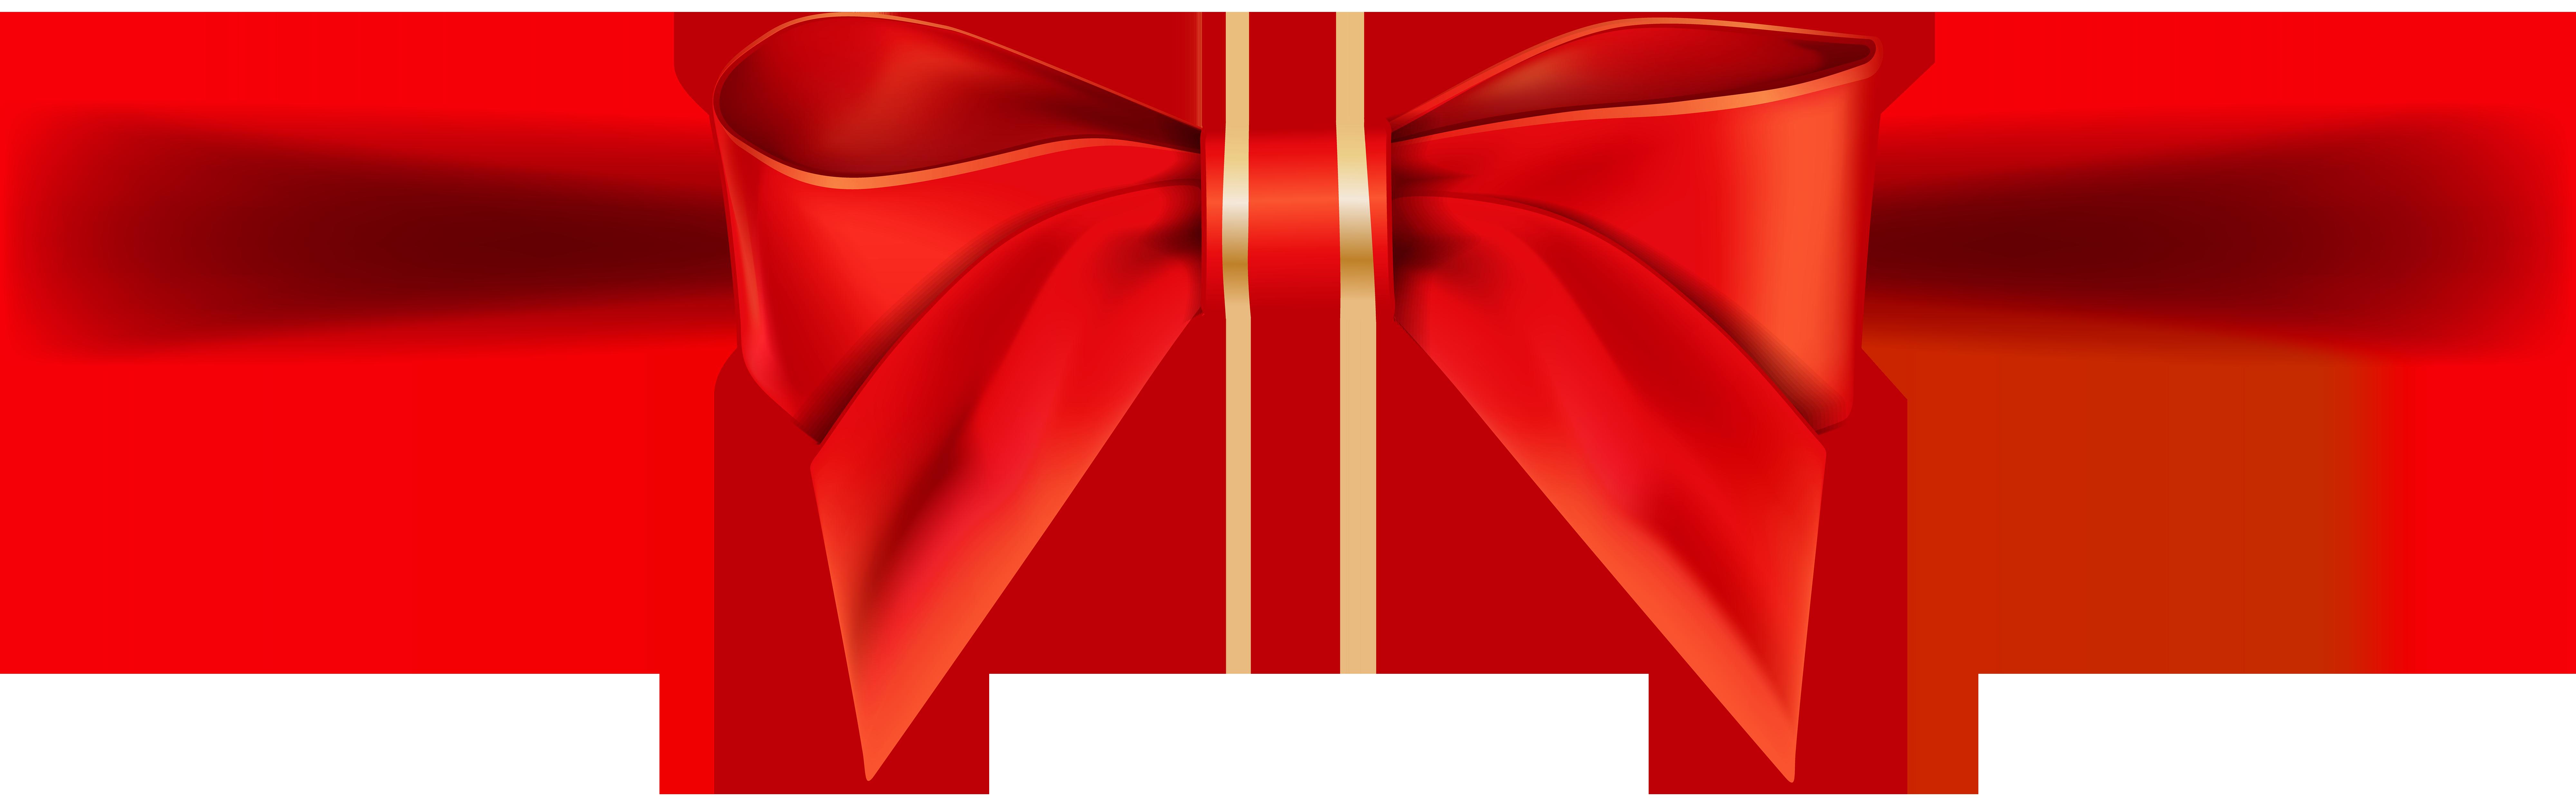 Ribbon transparent background clipart png transparent stock Red Ribbon Bow Transparent PNG Clip Art Image png transparent stock